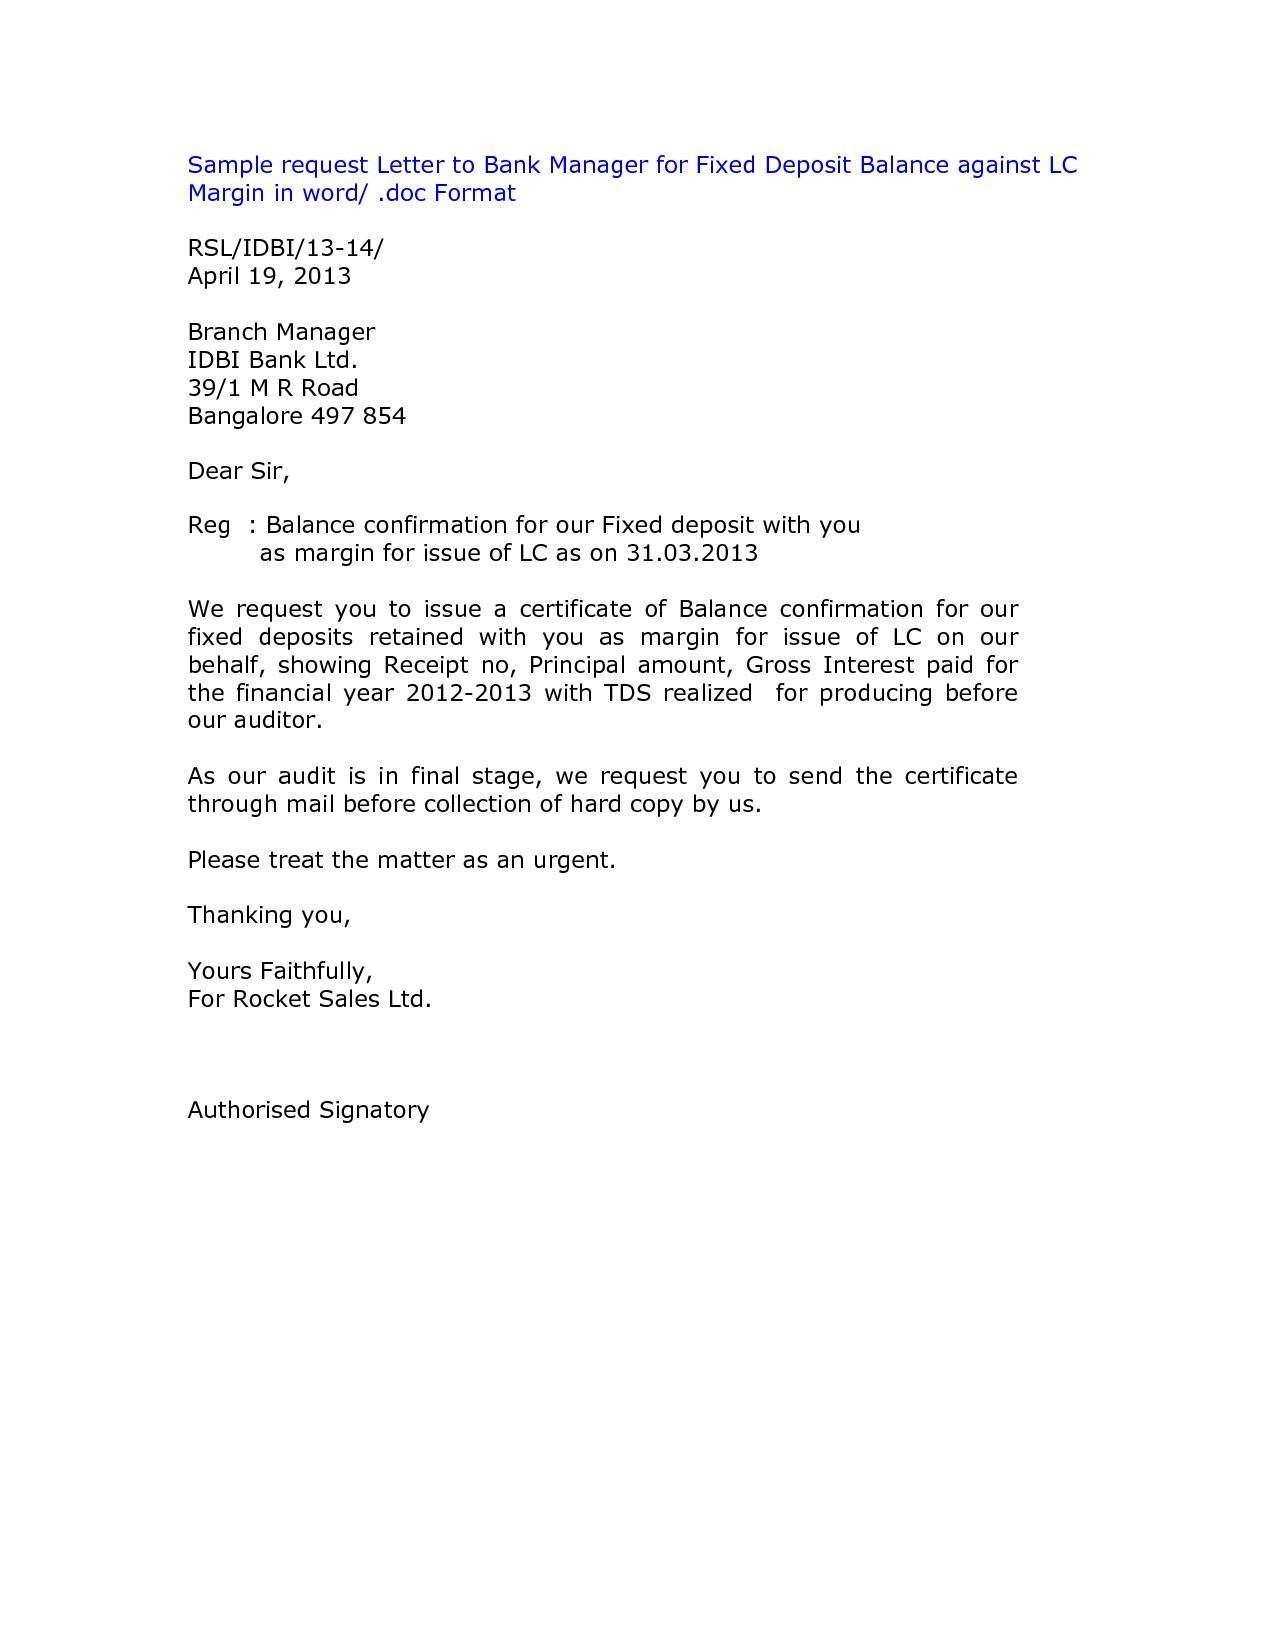 Audit Confirmation Request Template